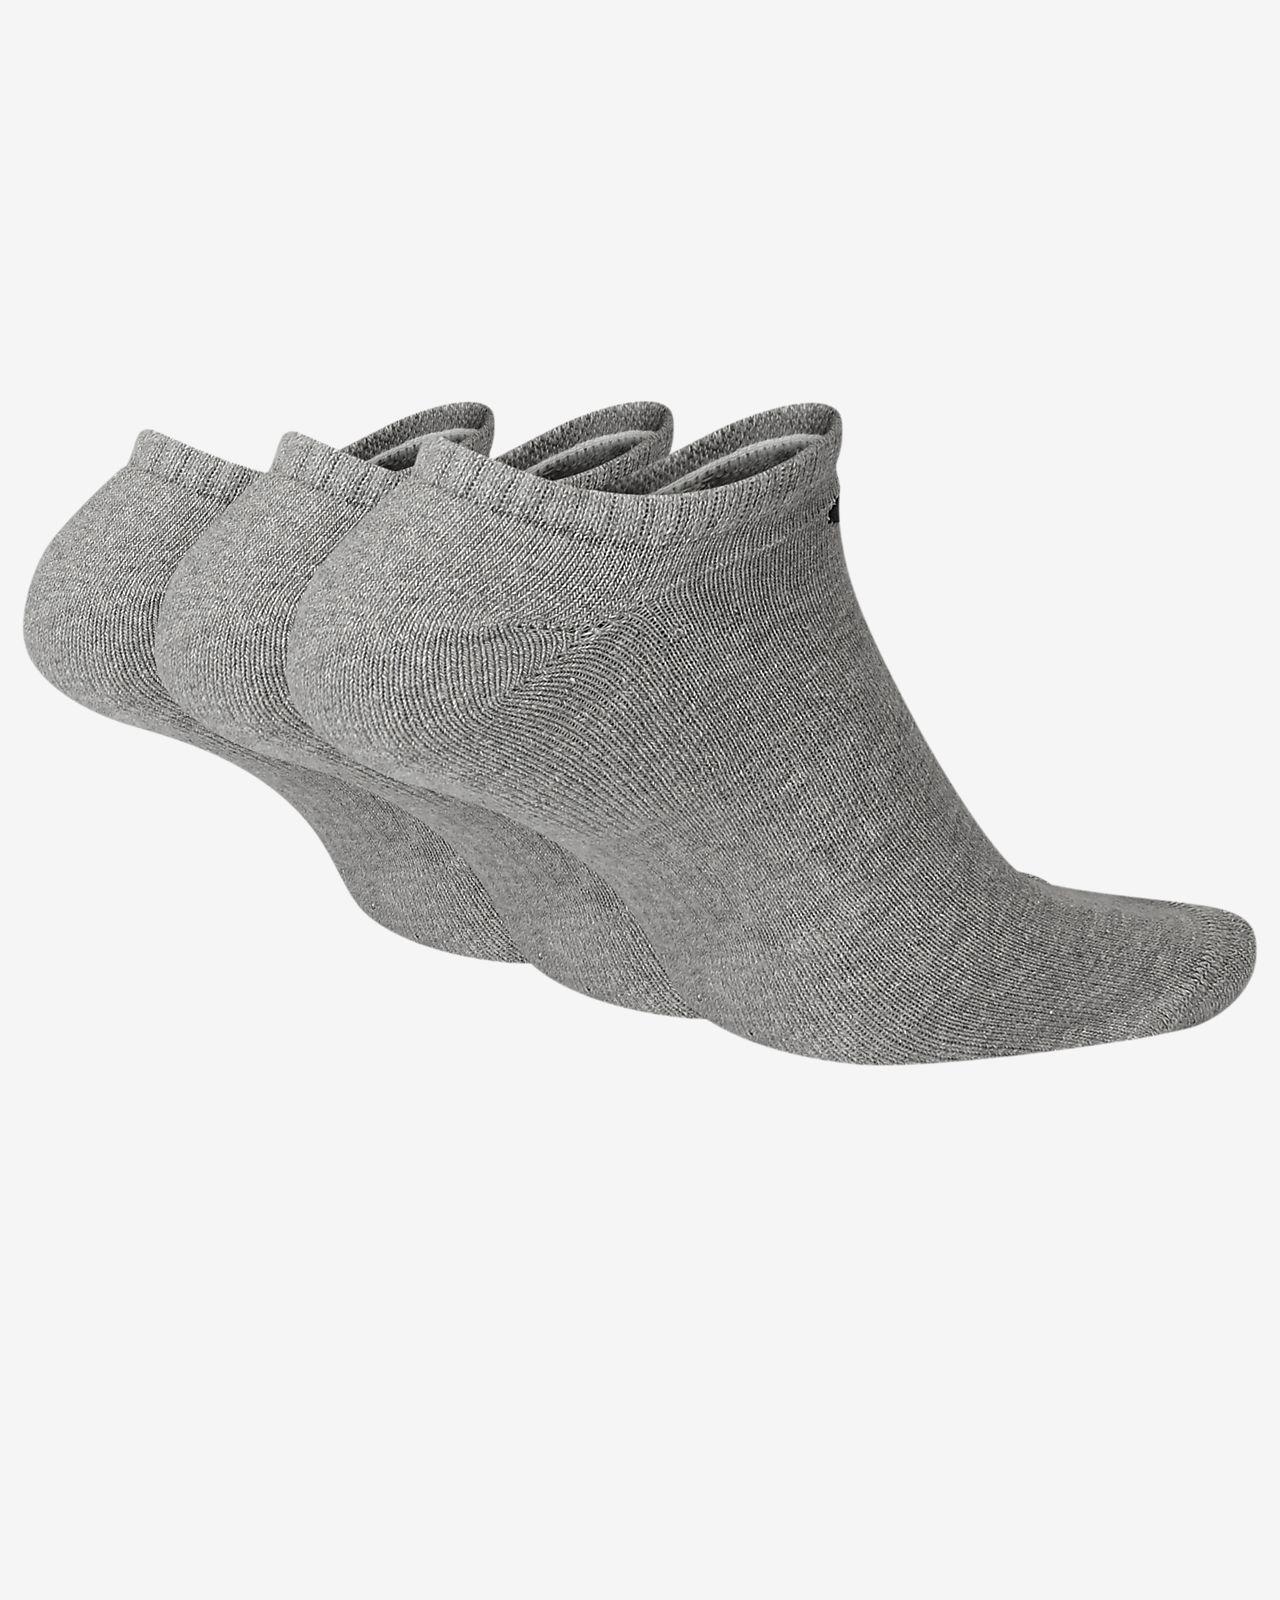 size 40 65609 49db1 ... Nike Everyday Cushion No-Show Training Socks (3 Pair)